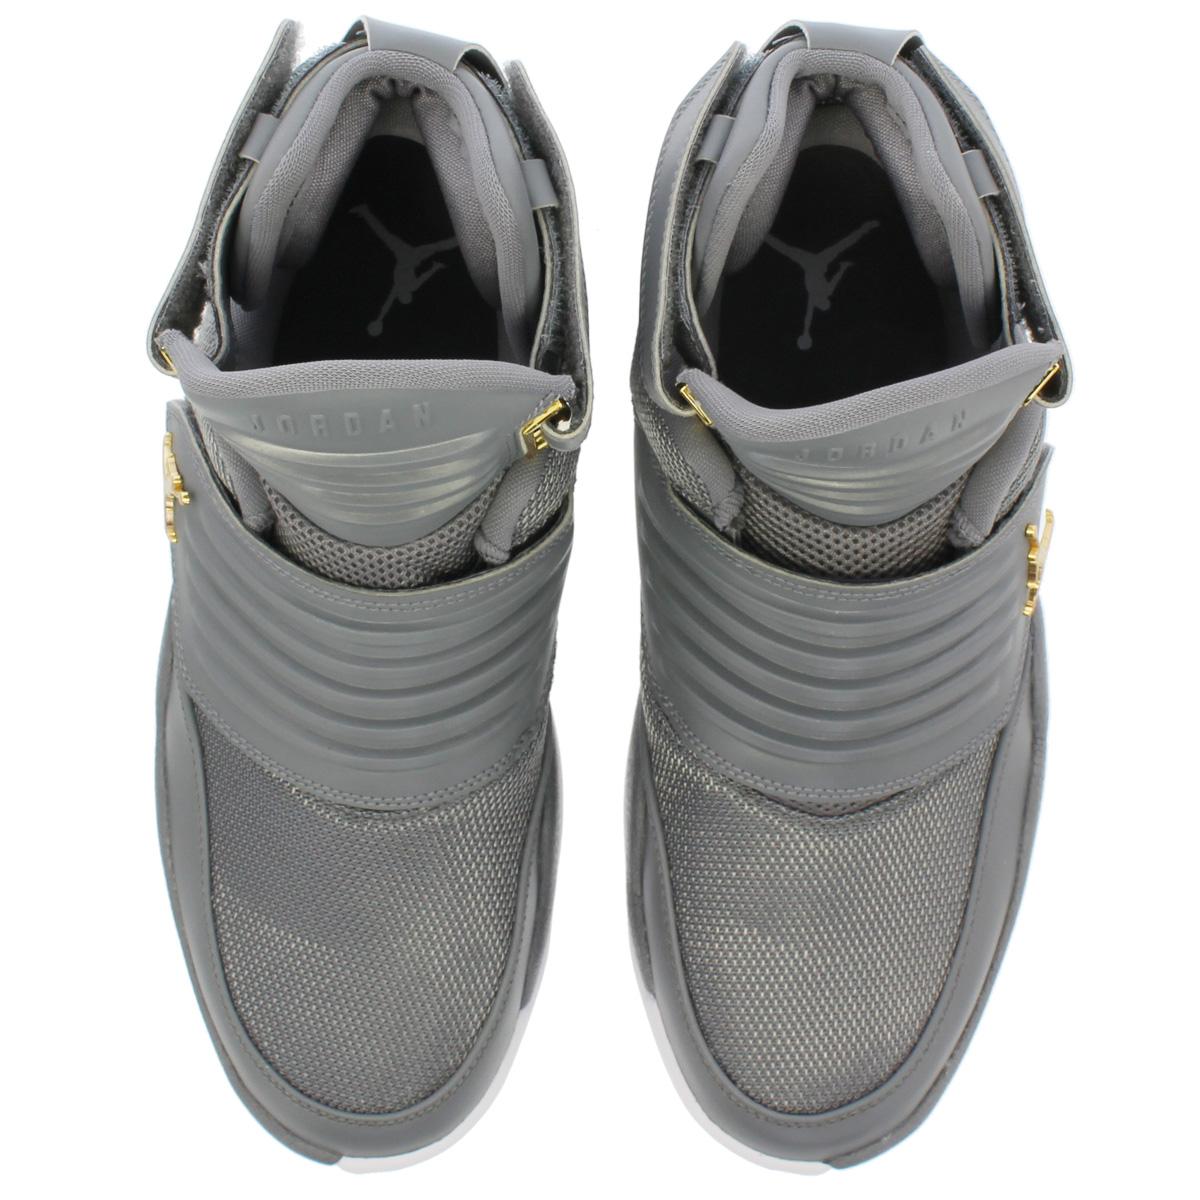 pretty nice 70b42 2a44f ... NIKE JORDAN GENERATION 23 Nike Jordan generation 23 COOL GREY WHITE GOLD  aa1294- ...